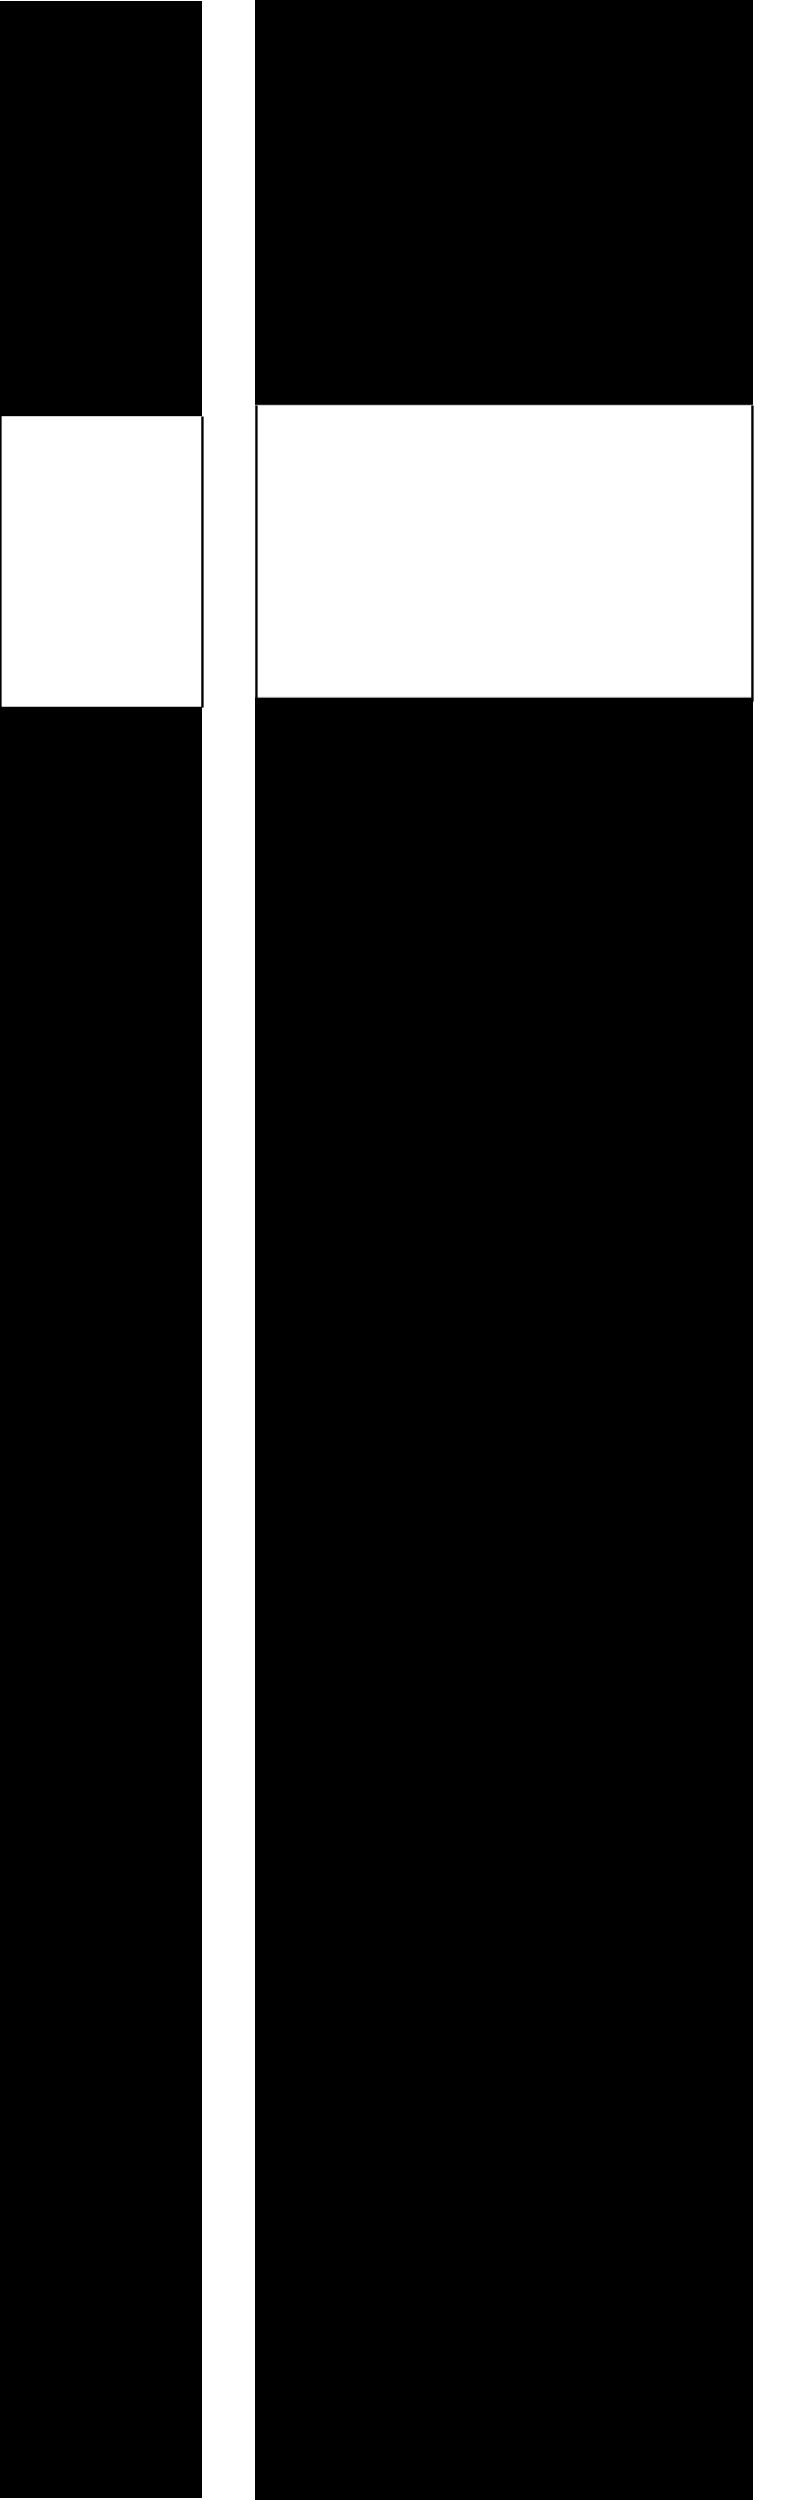 Main Grid sub cutting strip set.jpg